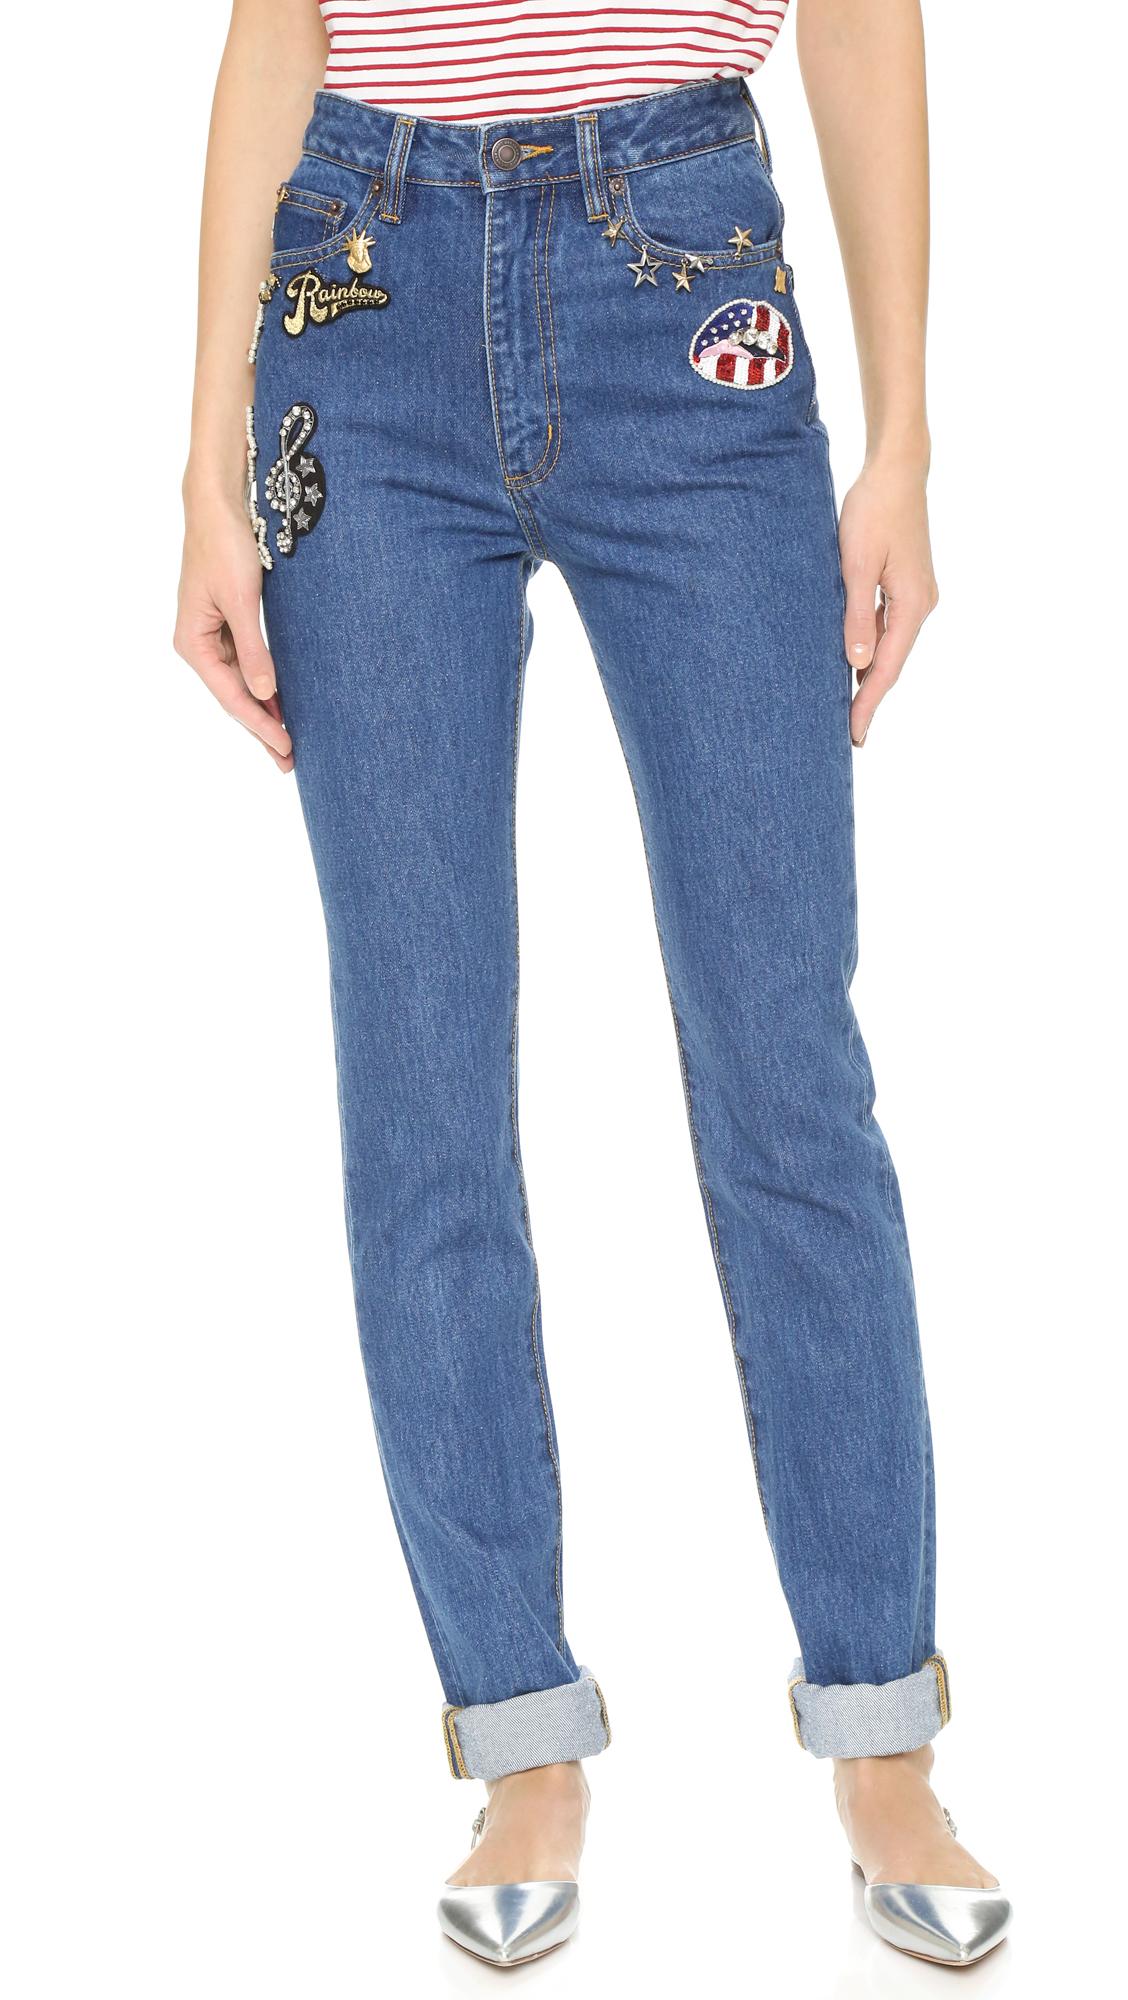 high waist jeans - Blue Marc Jacobs U72riONil